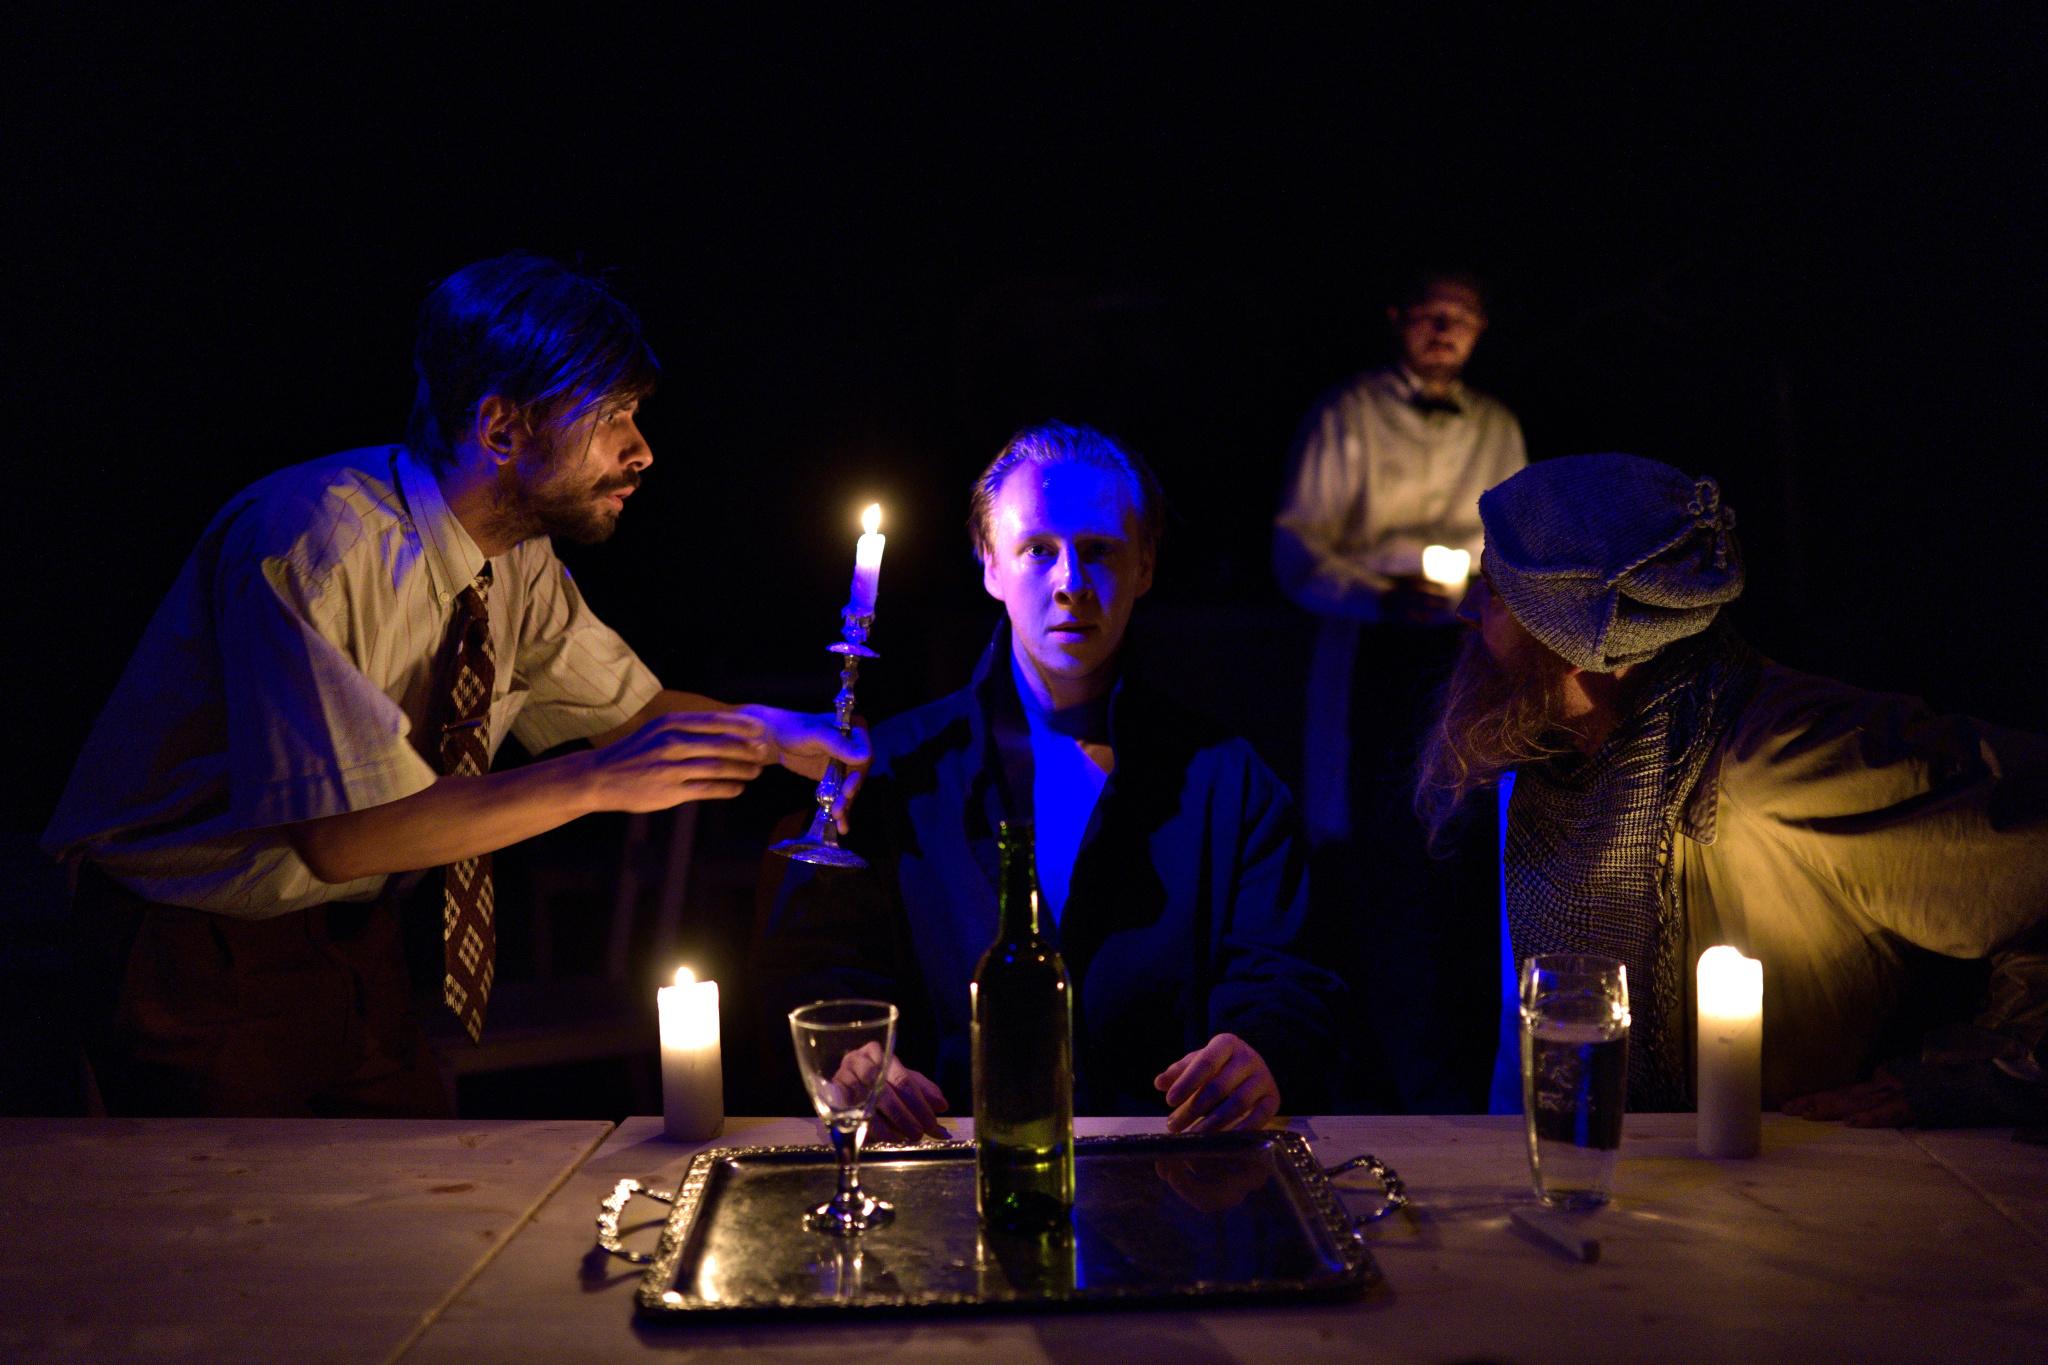 Theaterfotograf Roman Polášek: Man muss das Theater unter der Haut haben